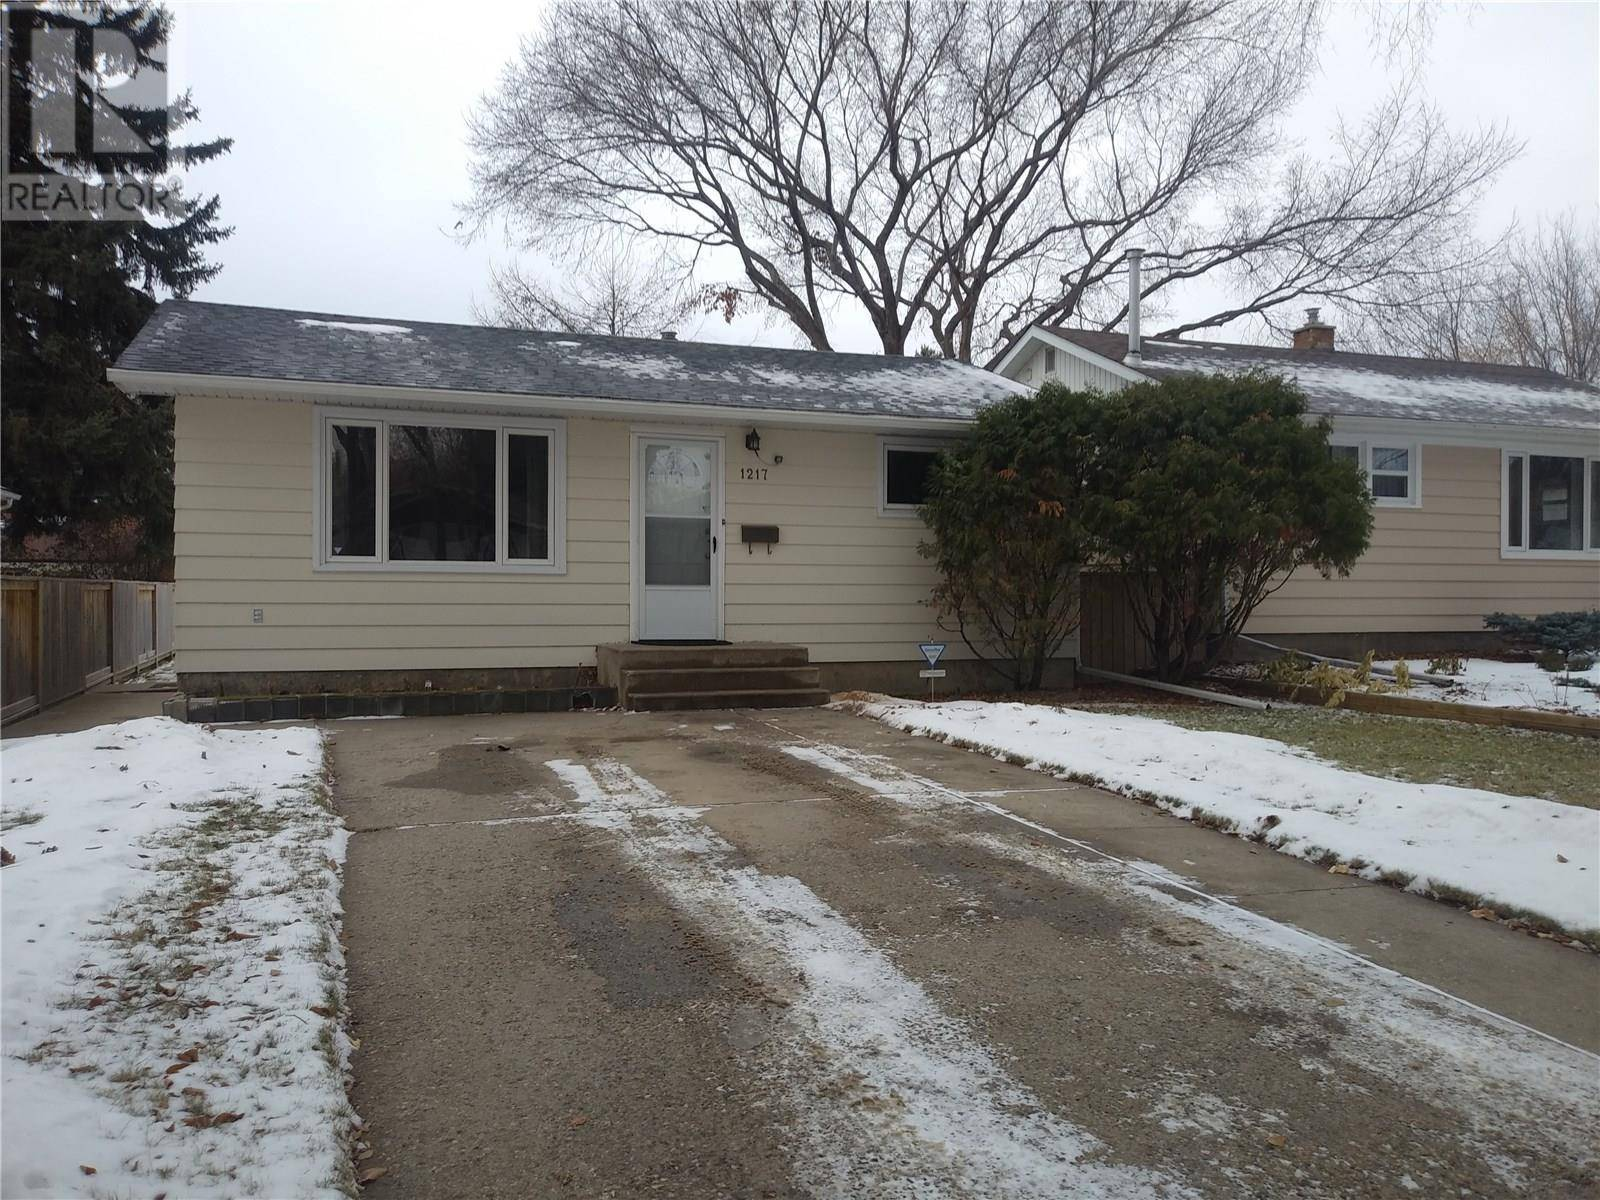 House for sale at 1217 J Ave S Saskatoon Saskatchewan - MLS: SK792834